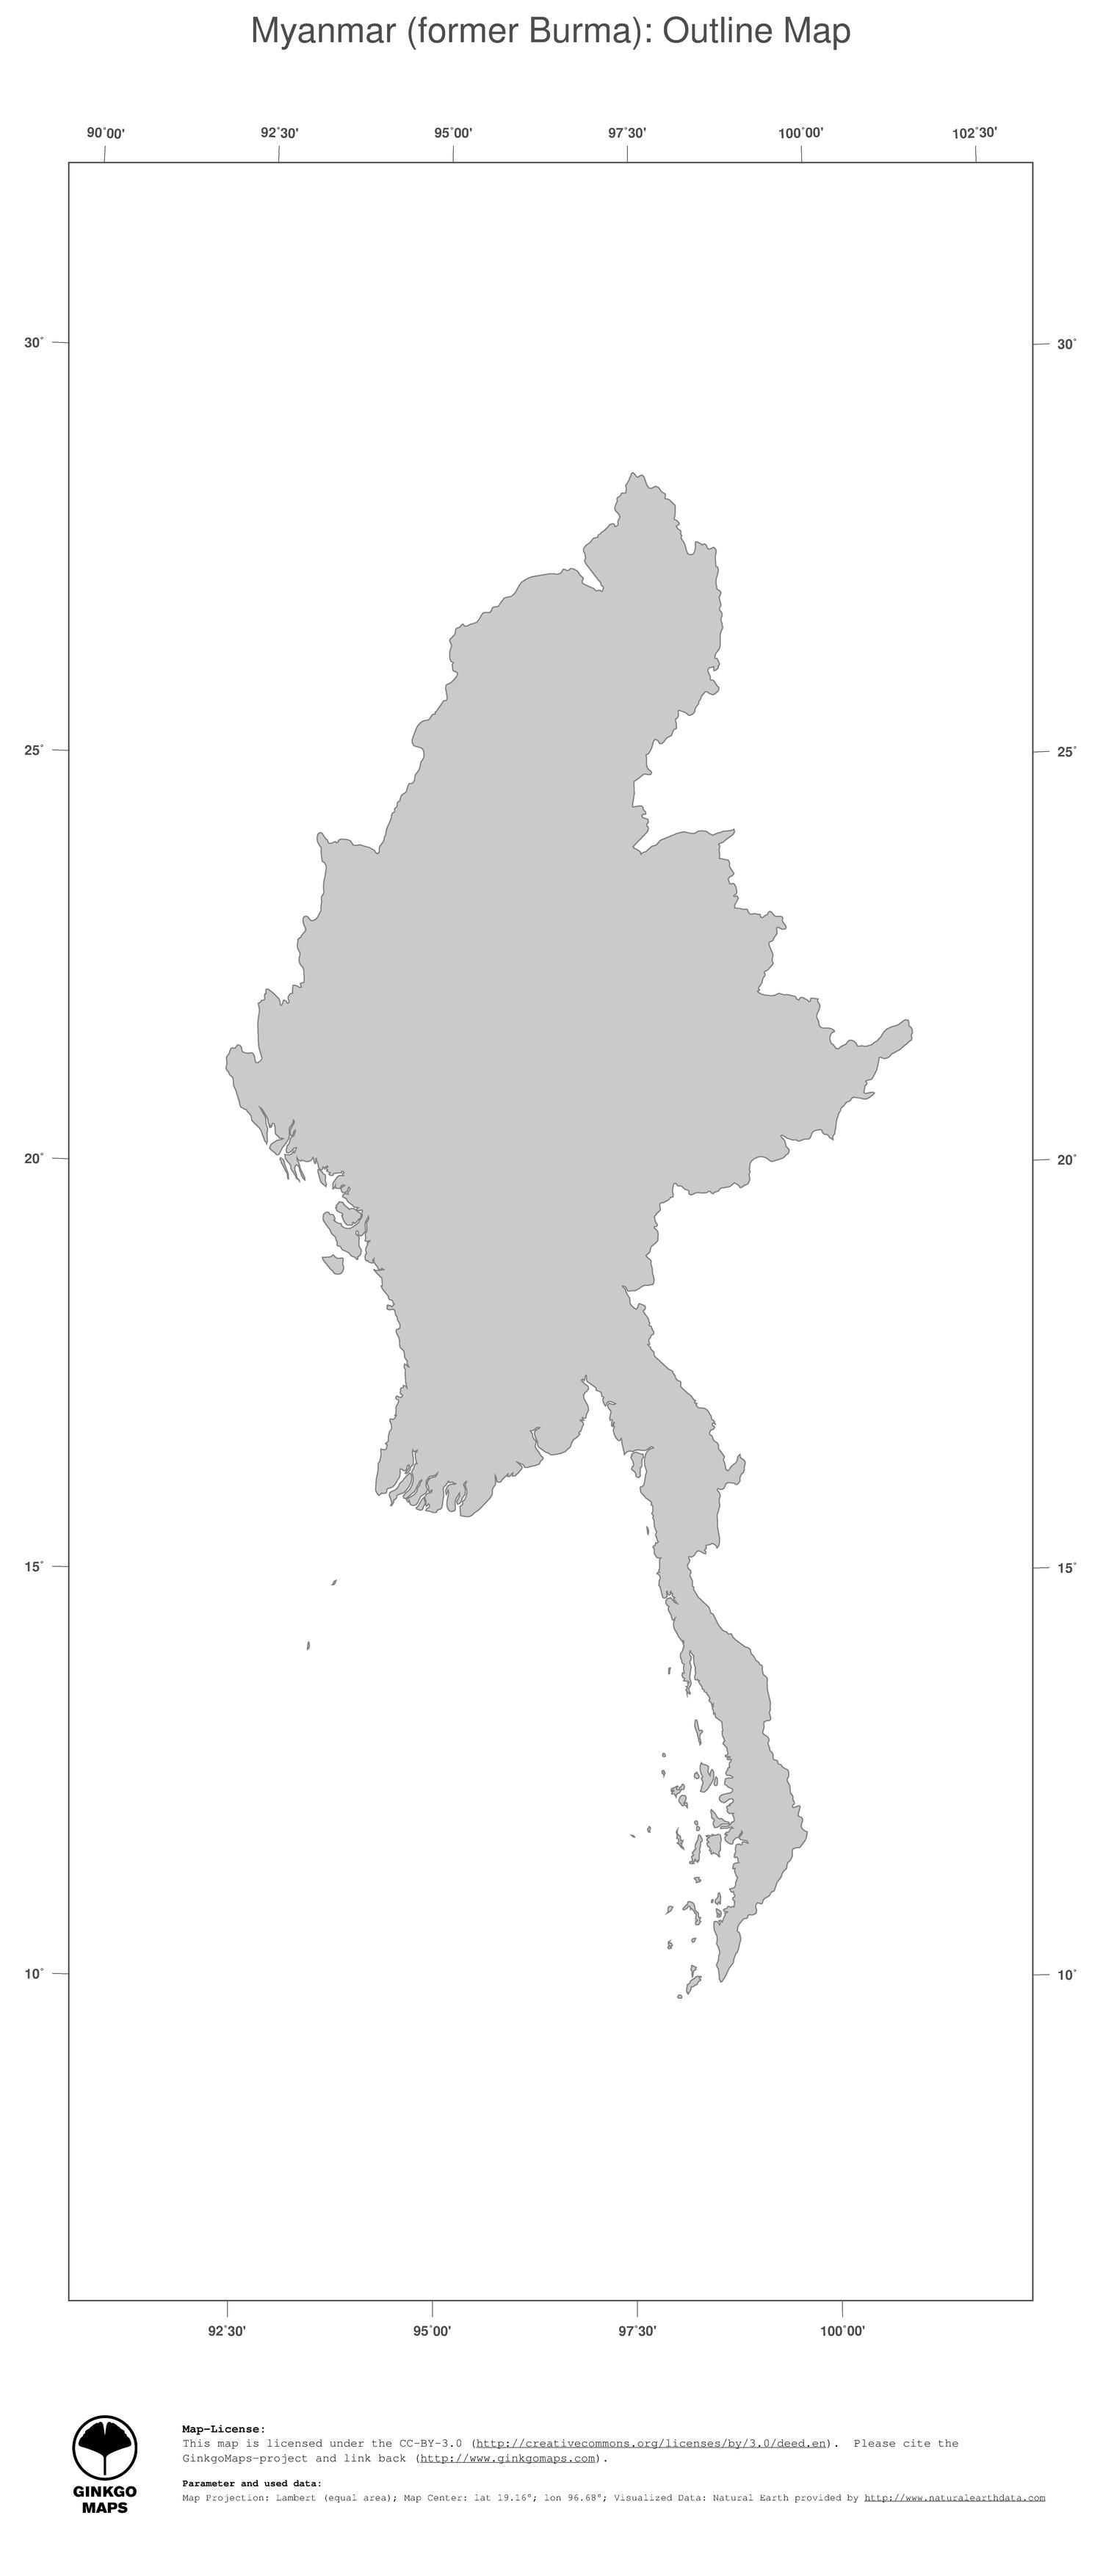 Map Myanmar former Burma GinkgoMaps continent Asia region